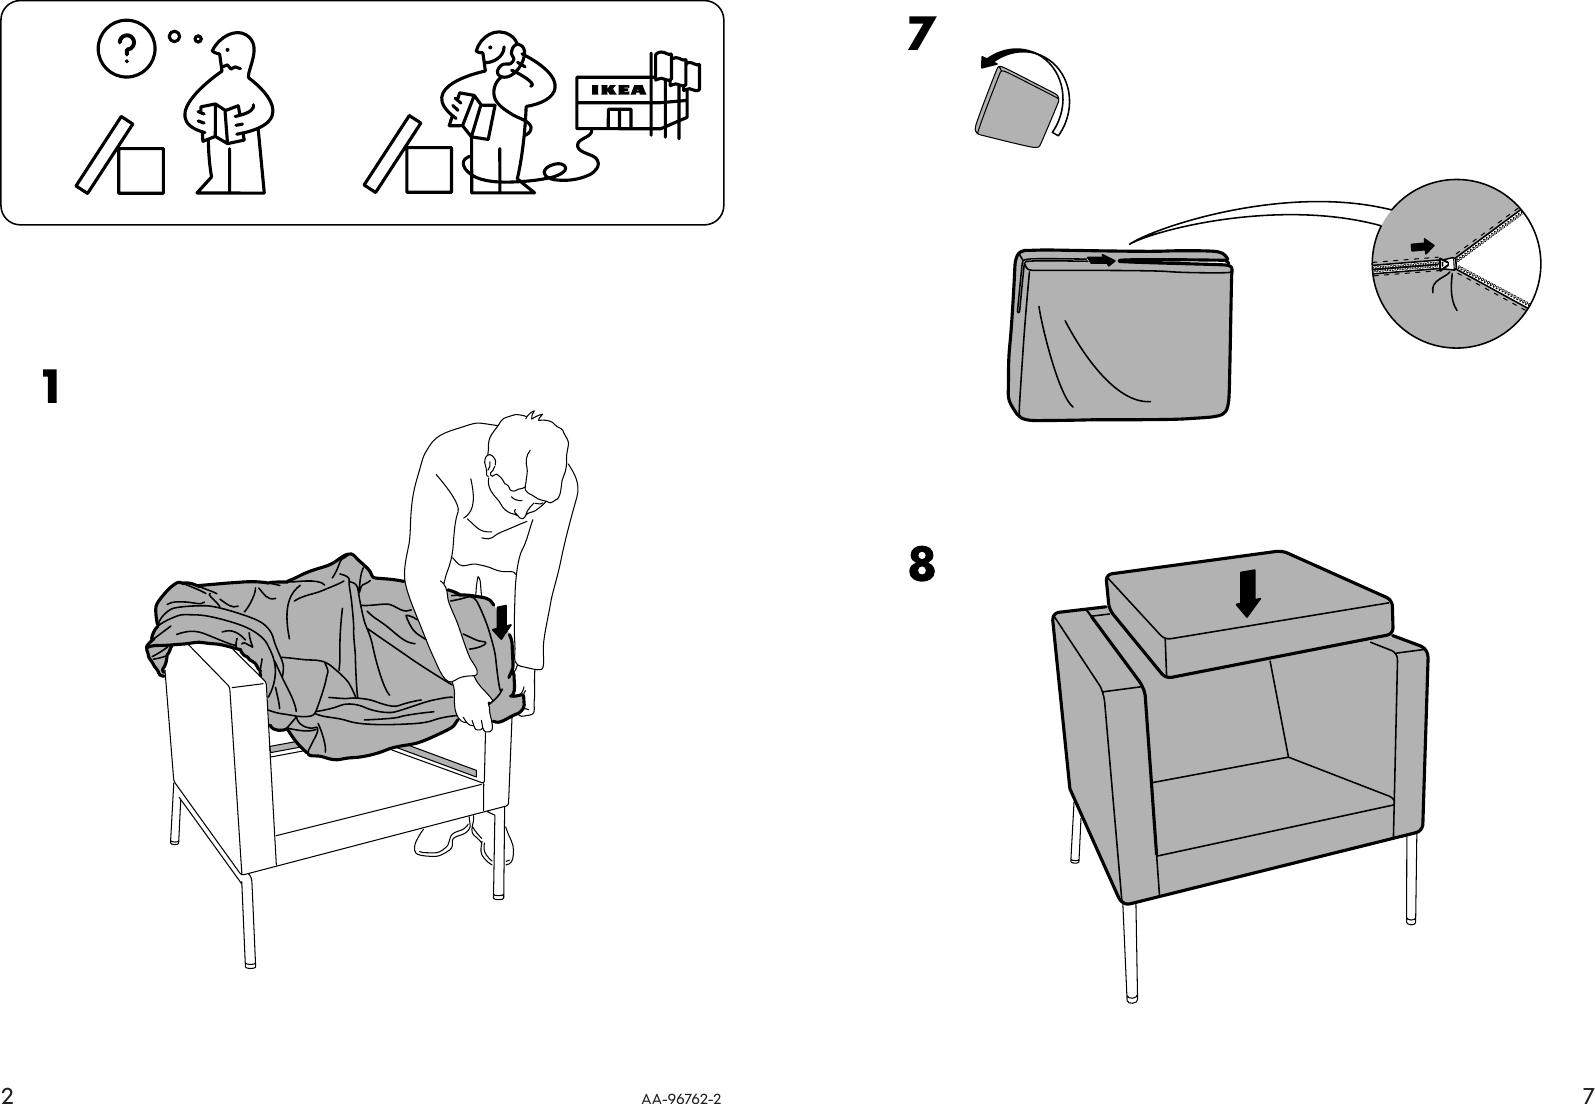 Enjoyable Ikea Klappsta Chair Cover Assembly Instruction Inzonedesignstudio Interior Chair Design Inzonedesignstudiocom